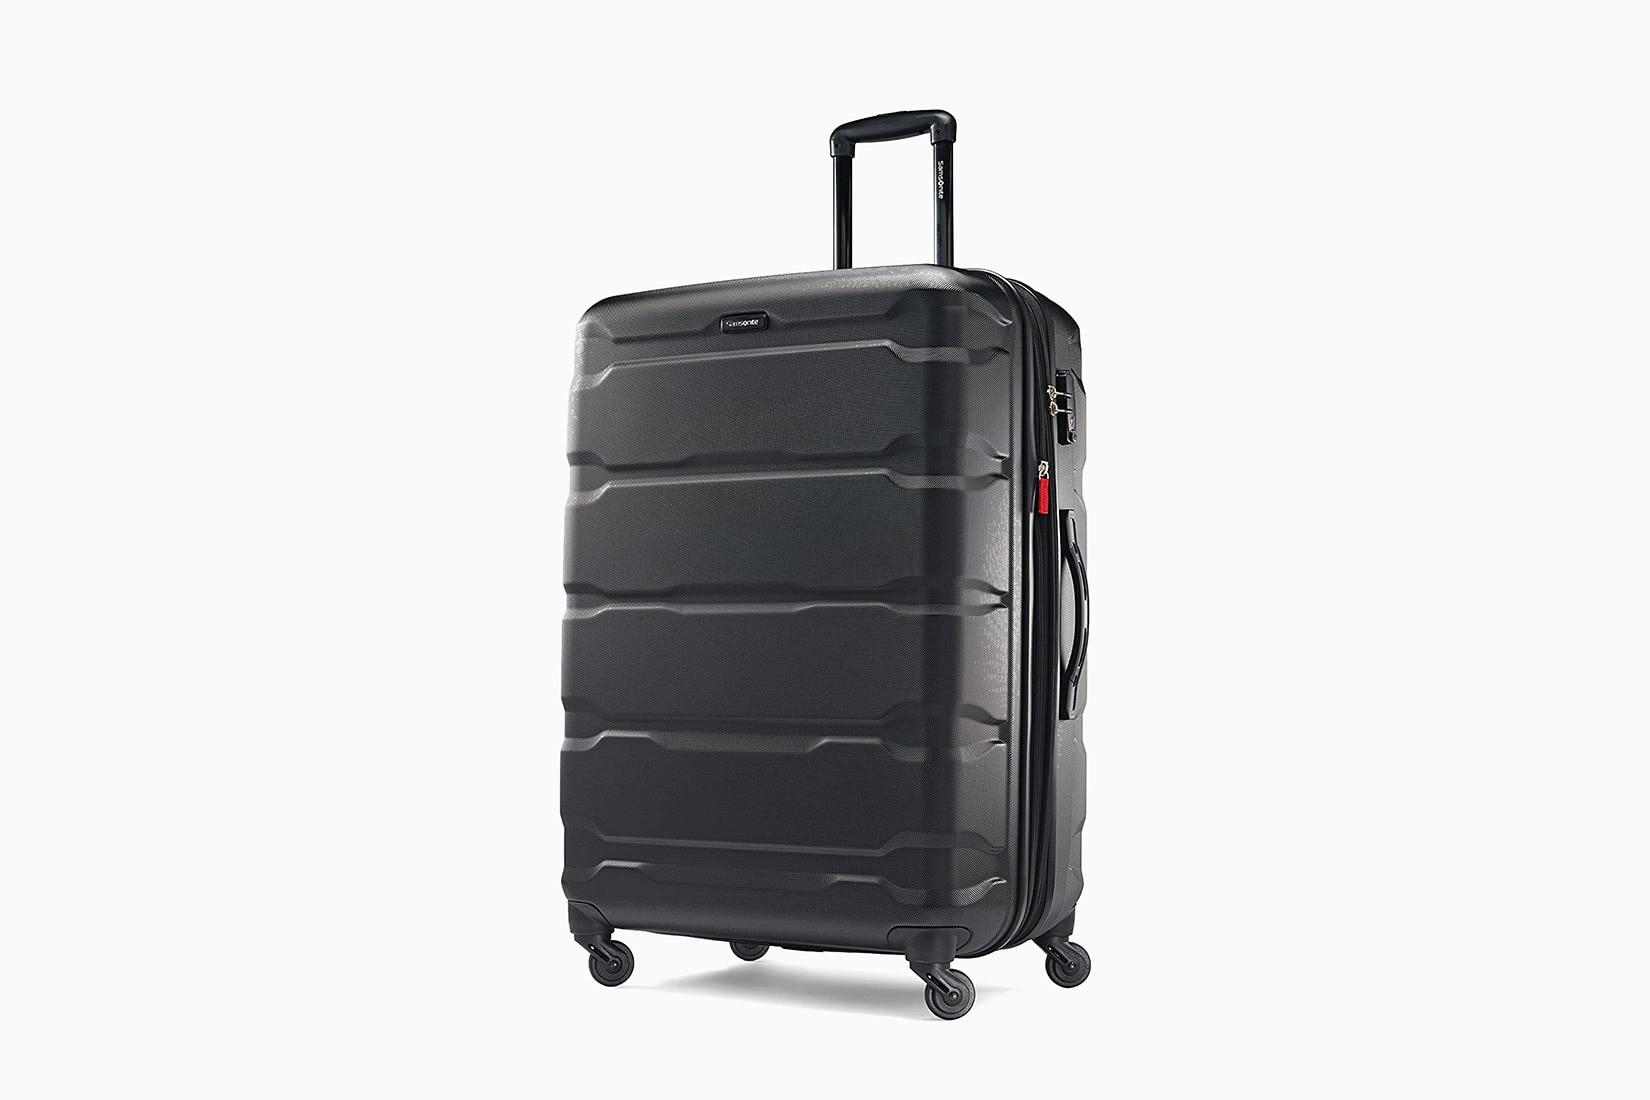 best luggage brands suitcase lightweight samsonite - Luxe Digital